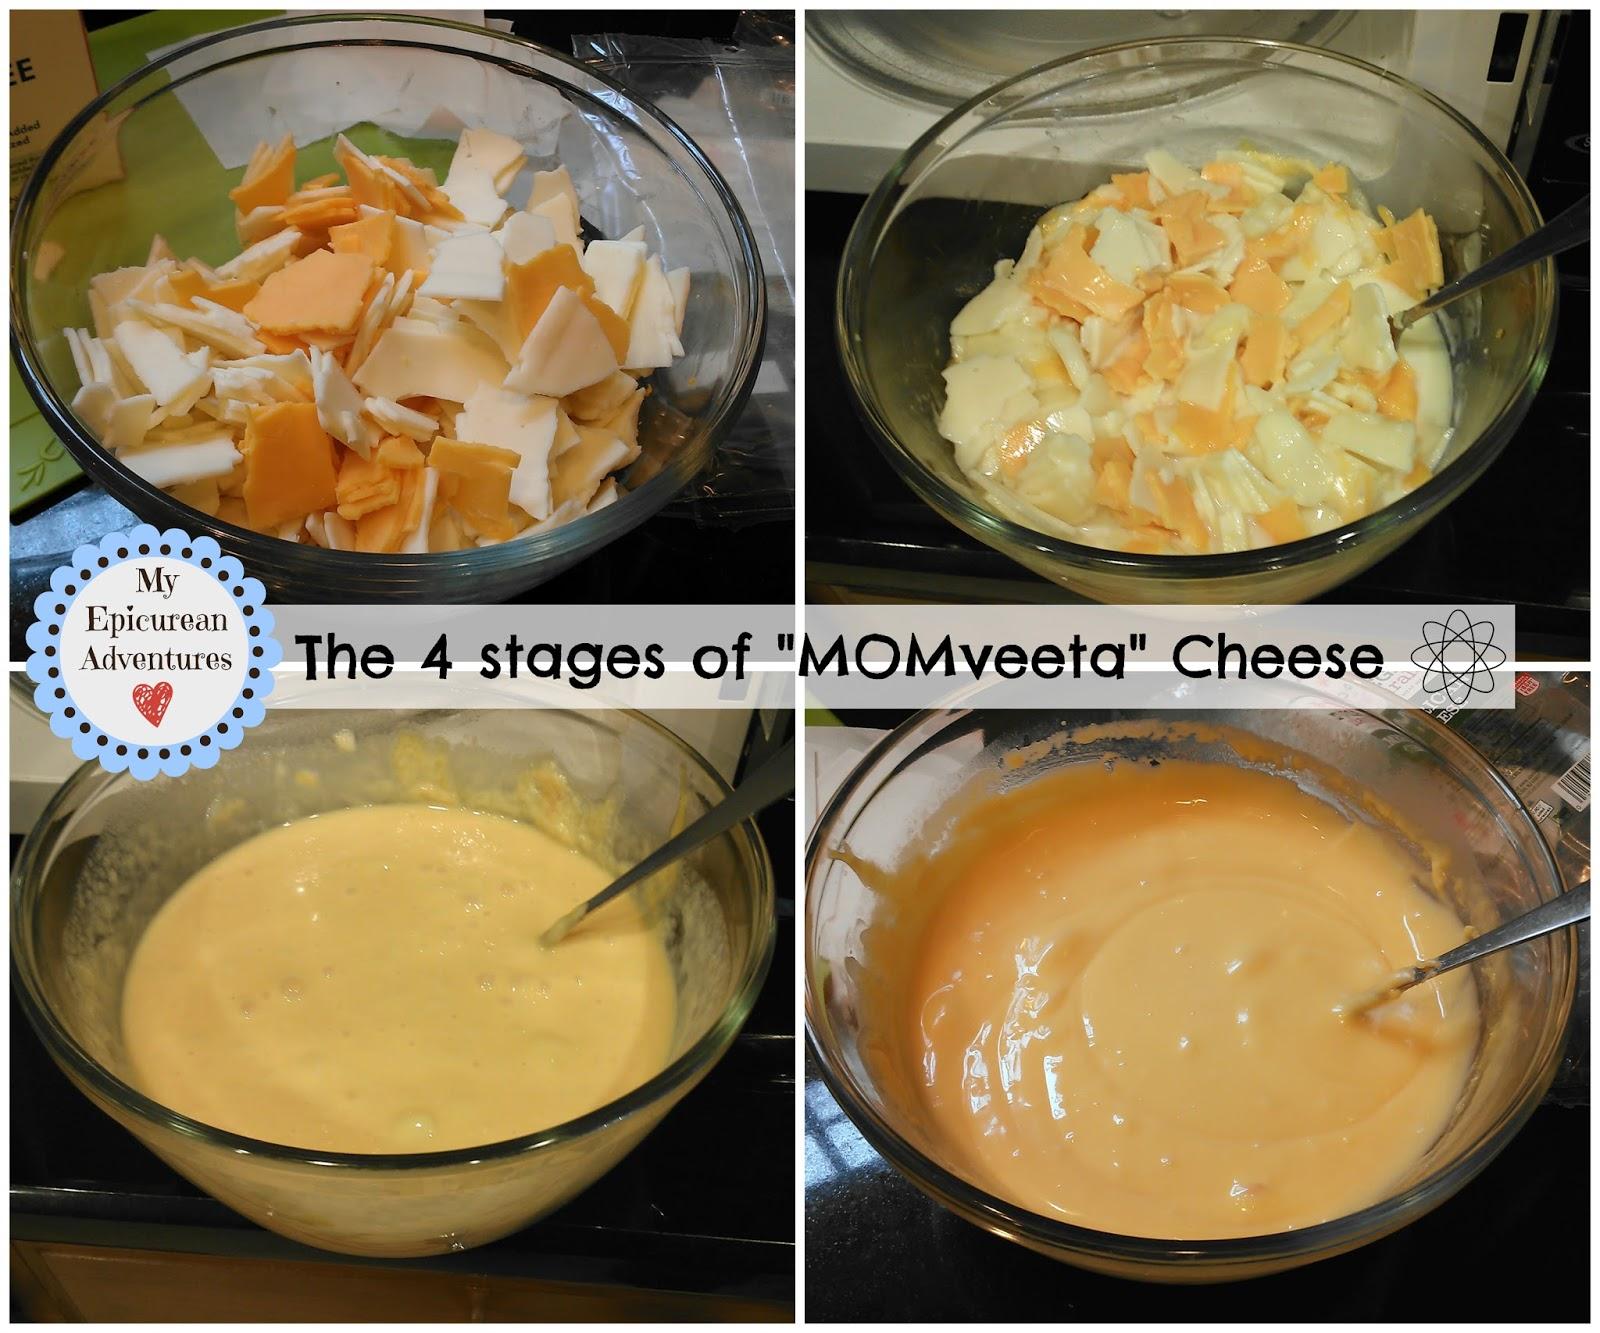 My Epicurean Adventures: MOMveeta: Homemade Velveeta Cheese and Dip